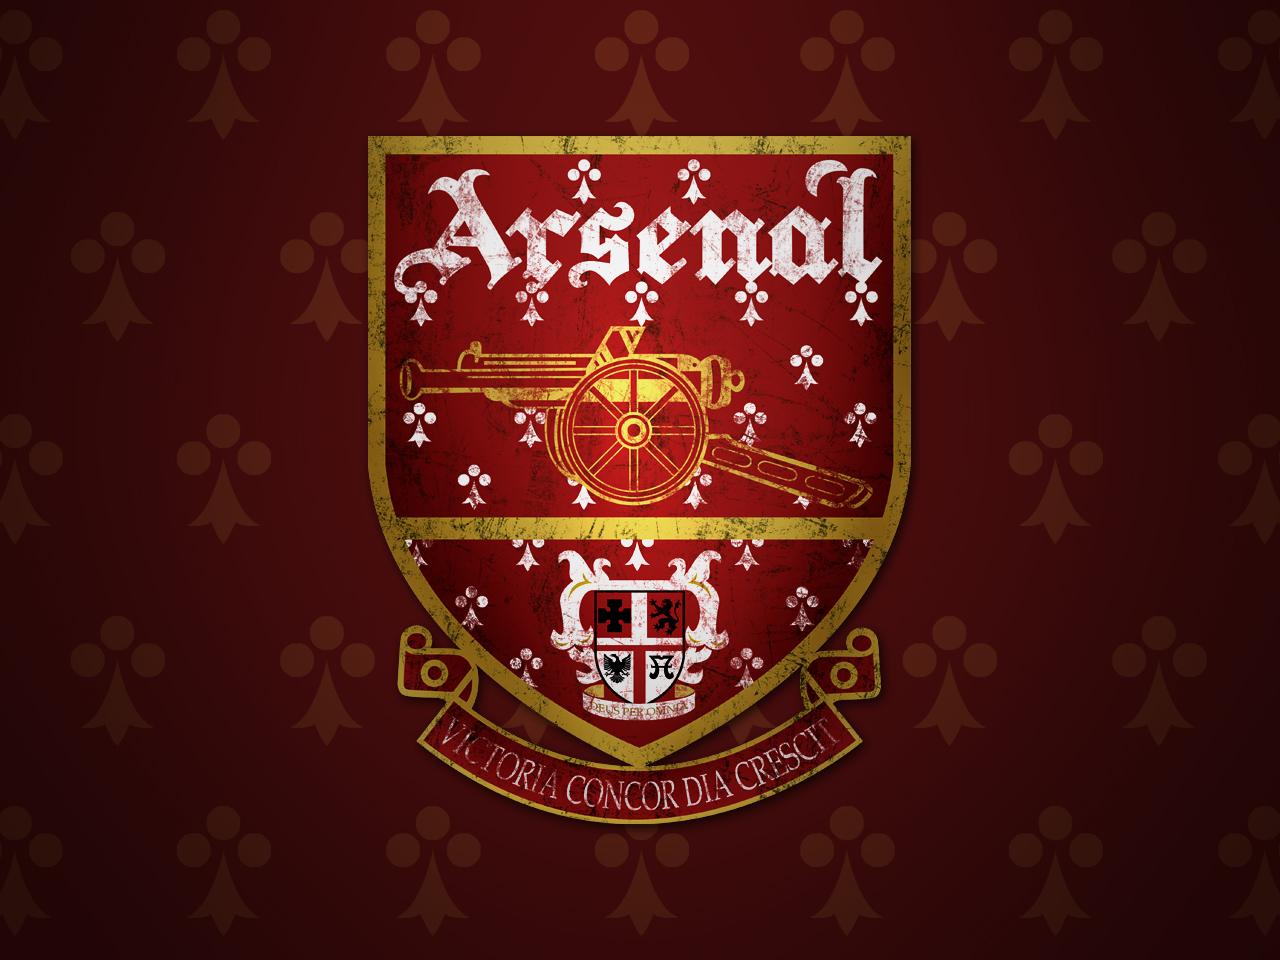 Arsenal The Best Football Club in Europe 2012 - Best Football Club